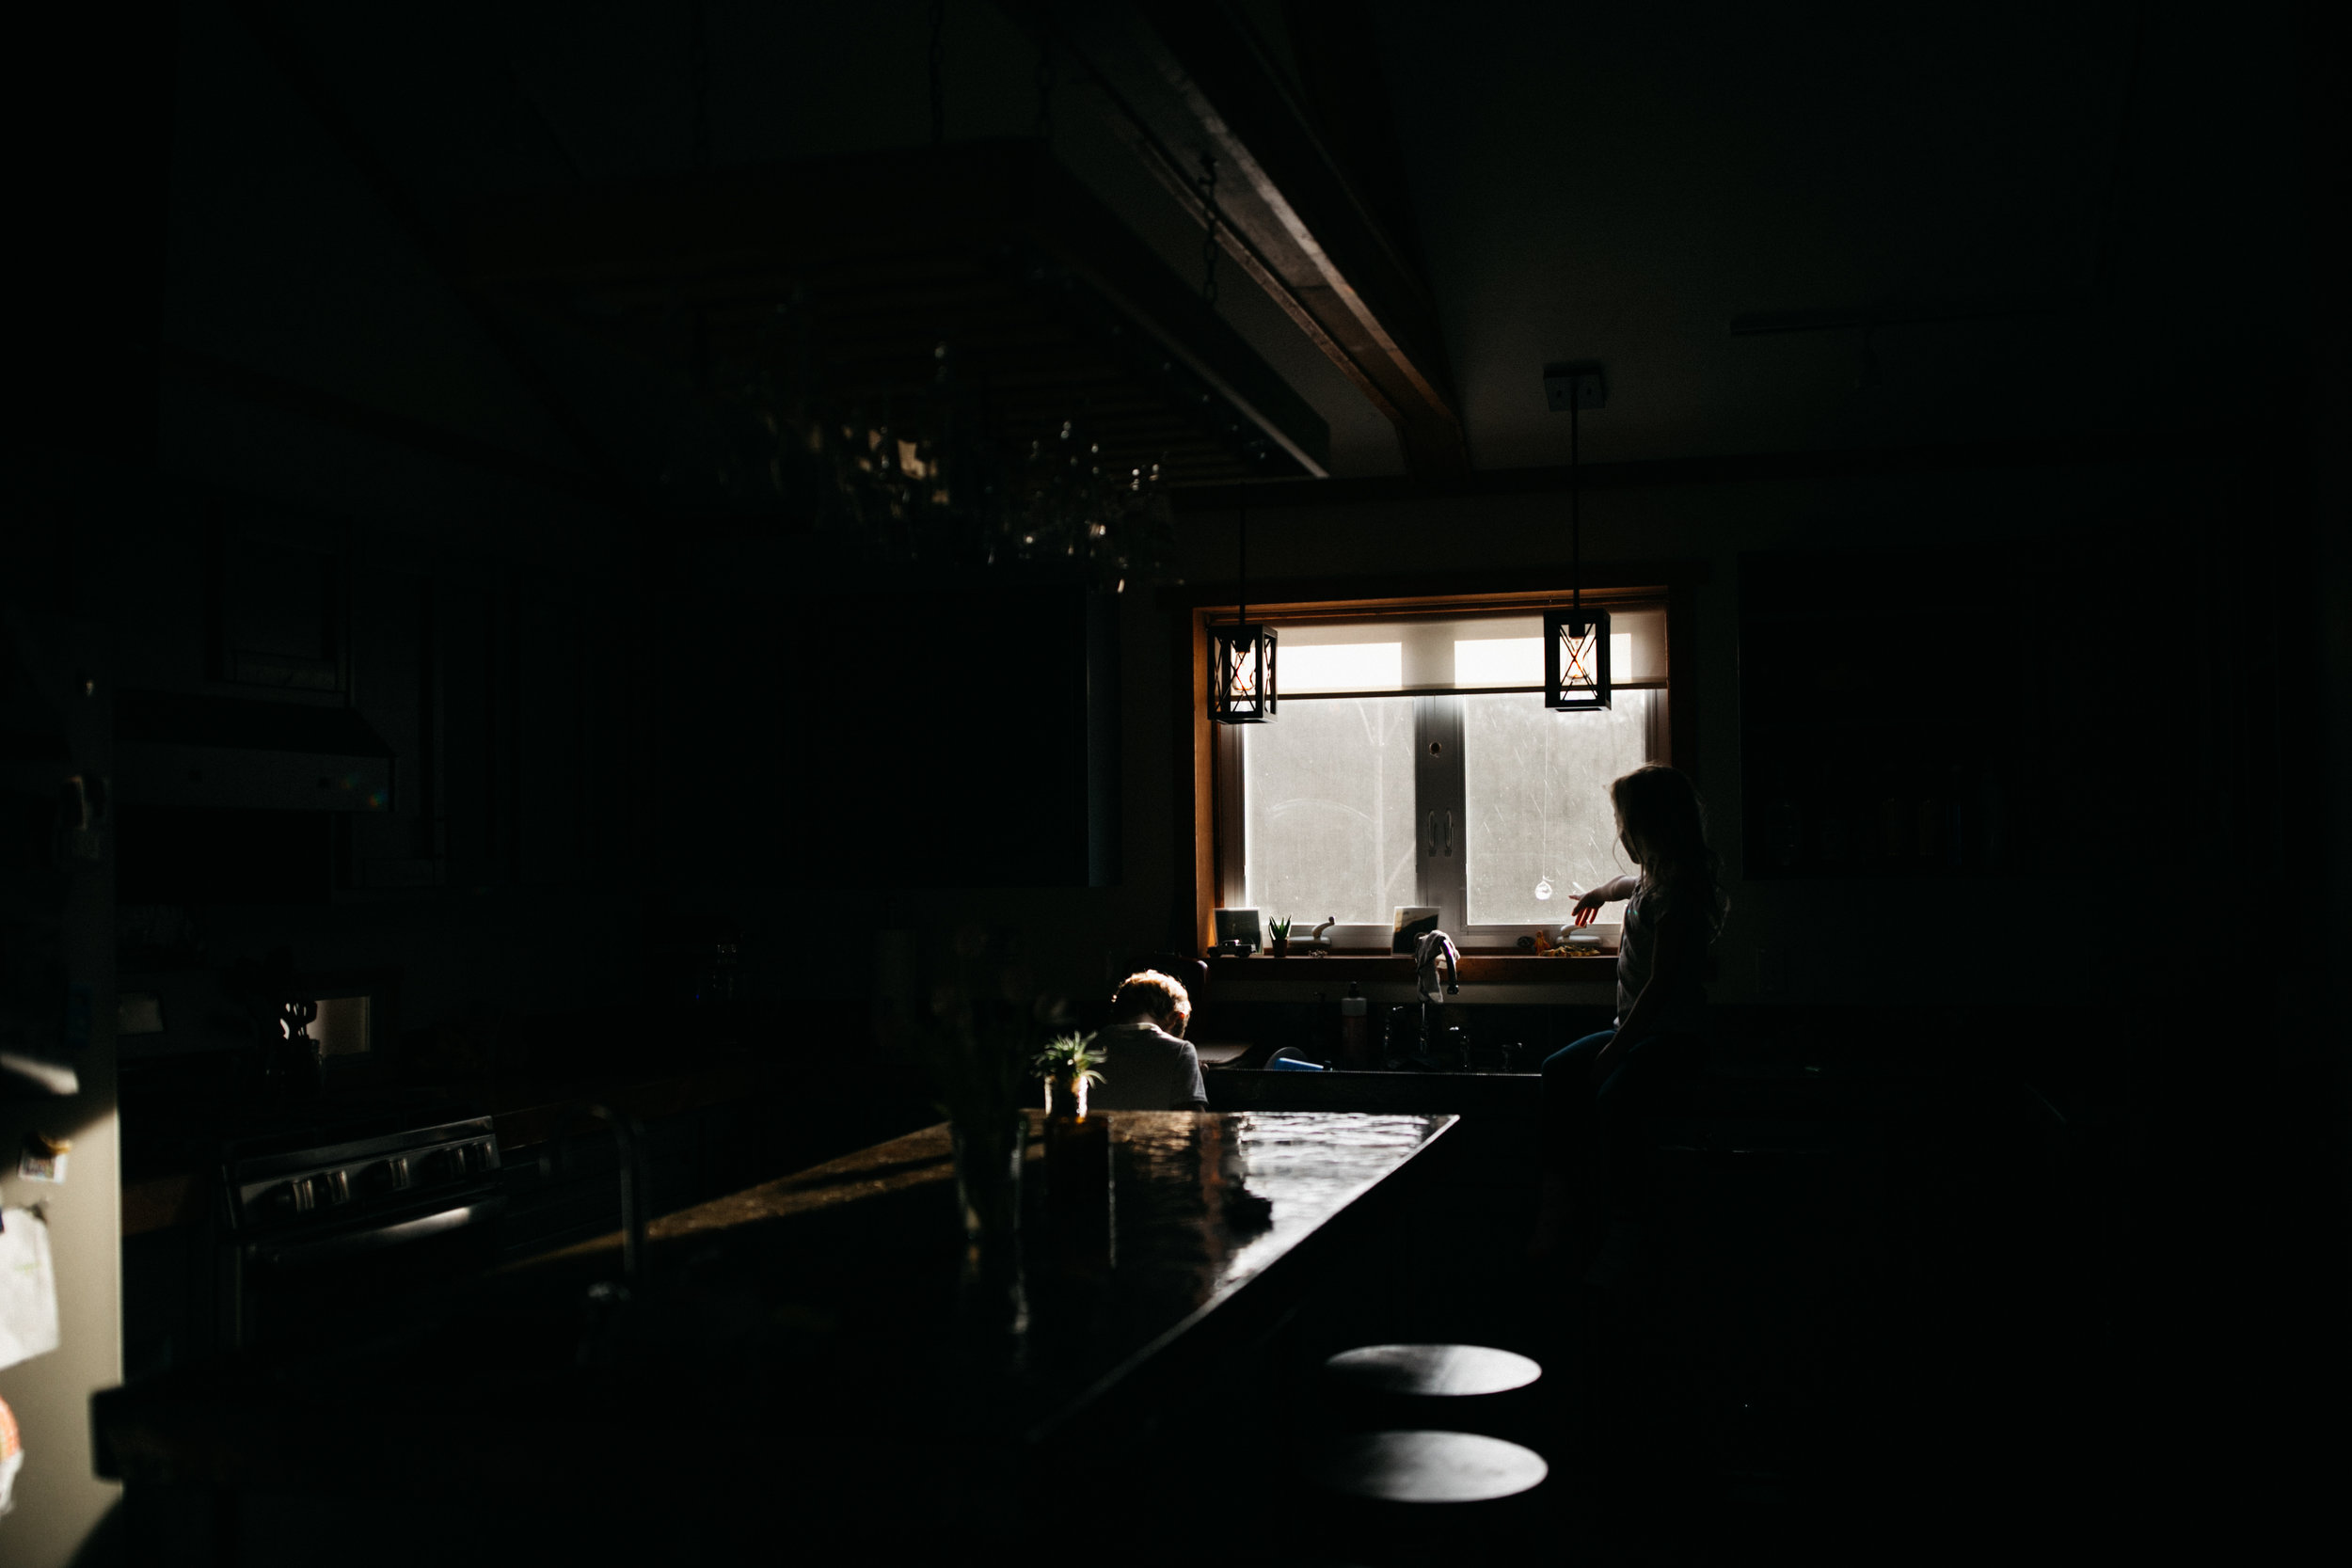 jessicamax-march-662.jpg